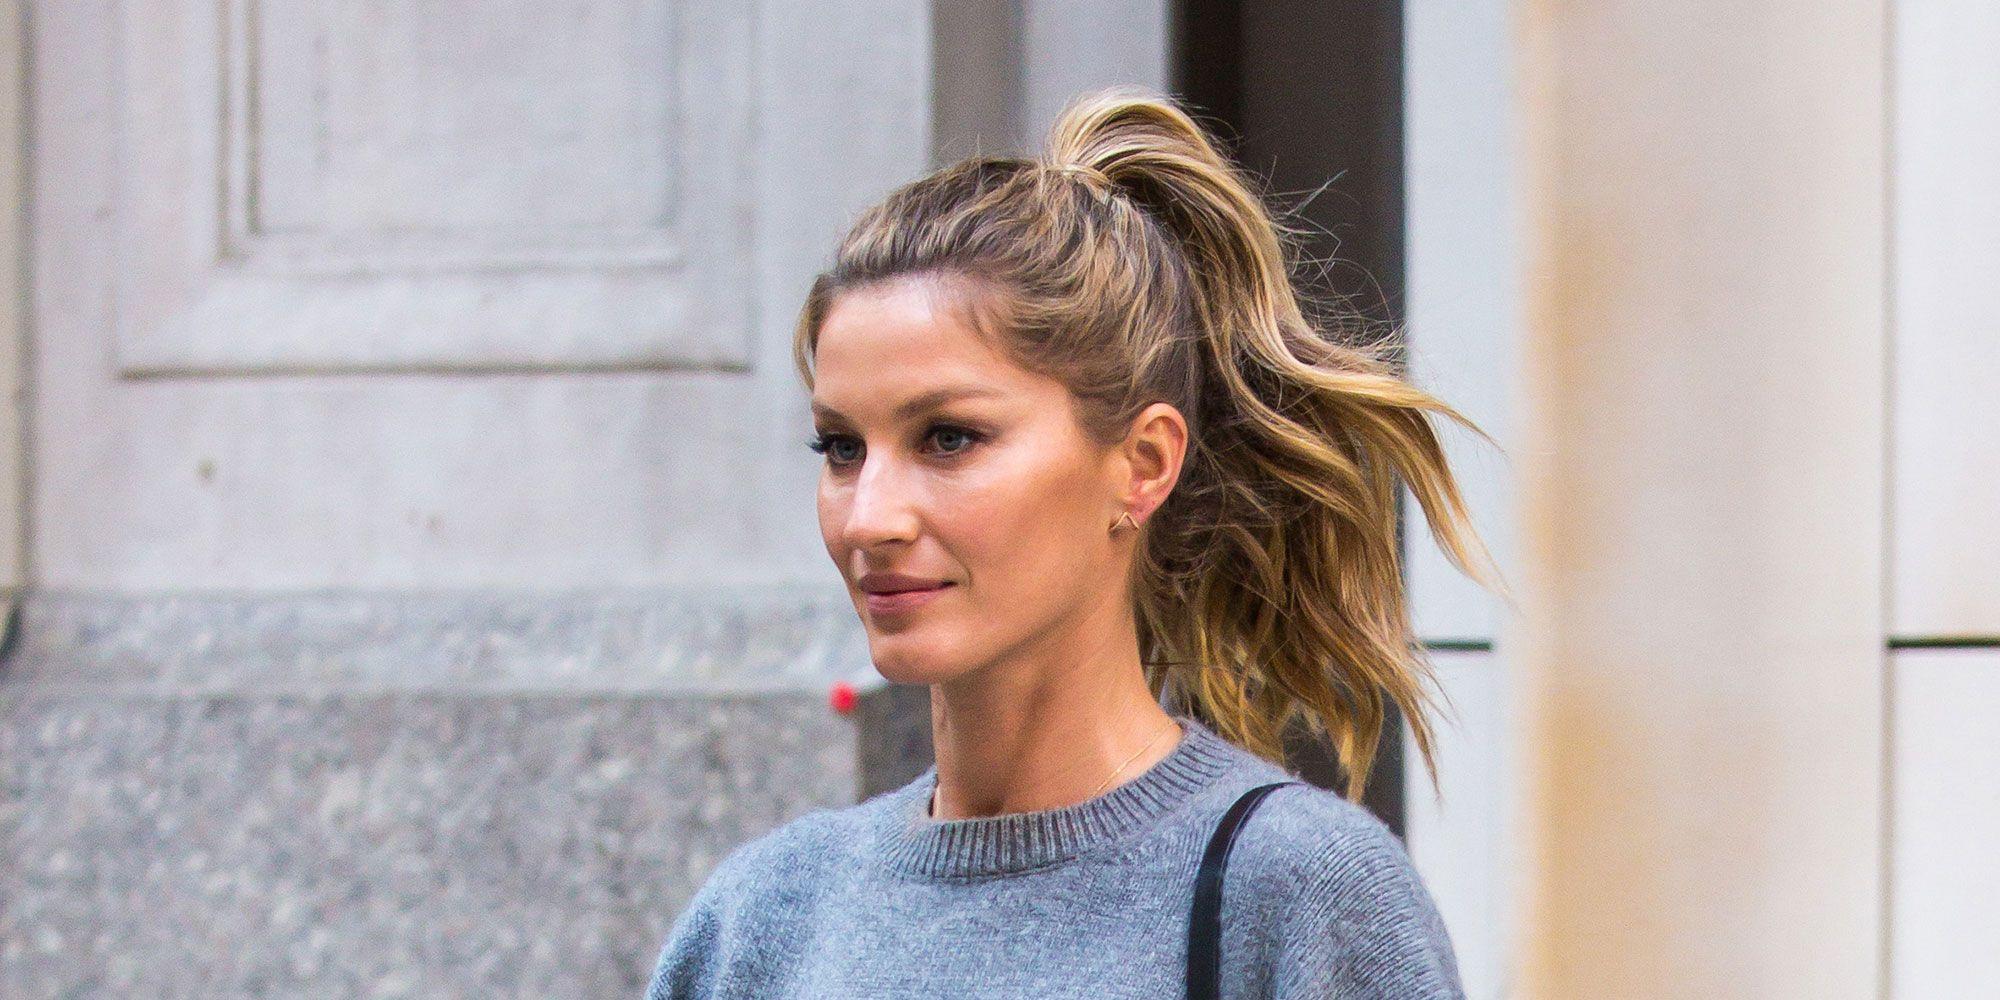 Gisele Bundchen had plastic surgery - boob job regrets